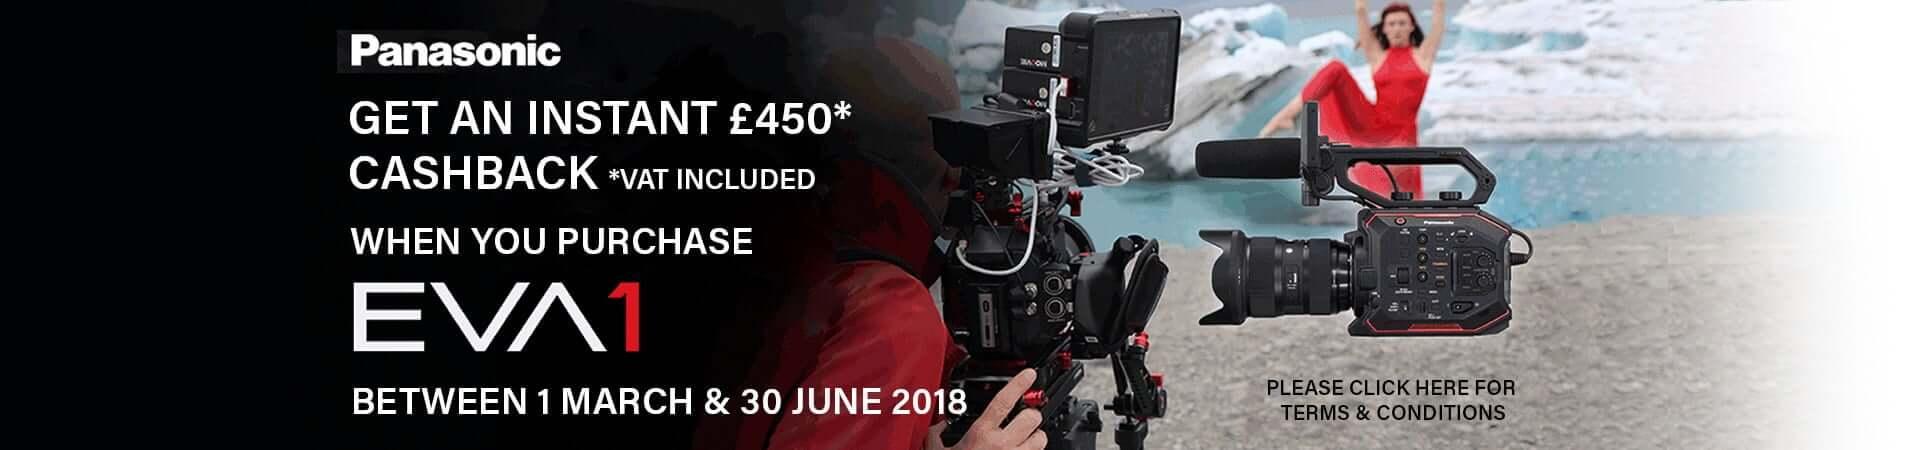 EVA1-GBP-Promotion.jpg